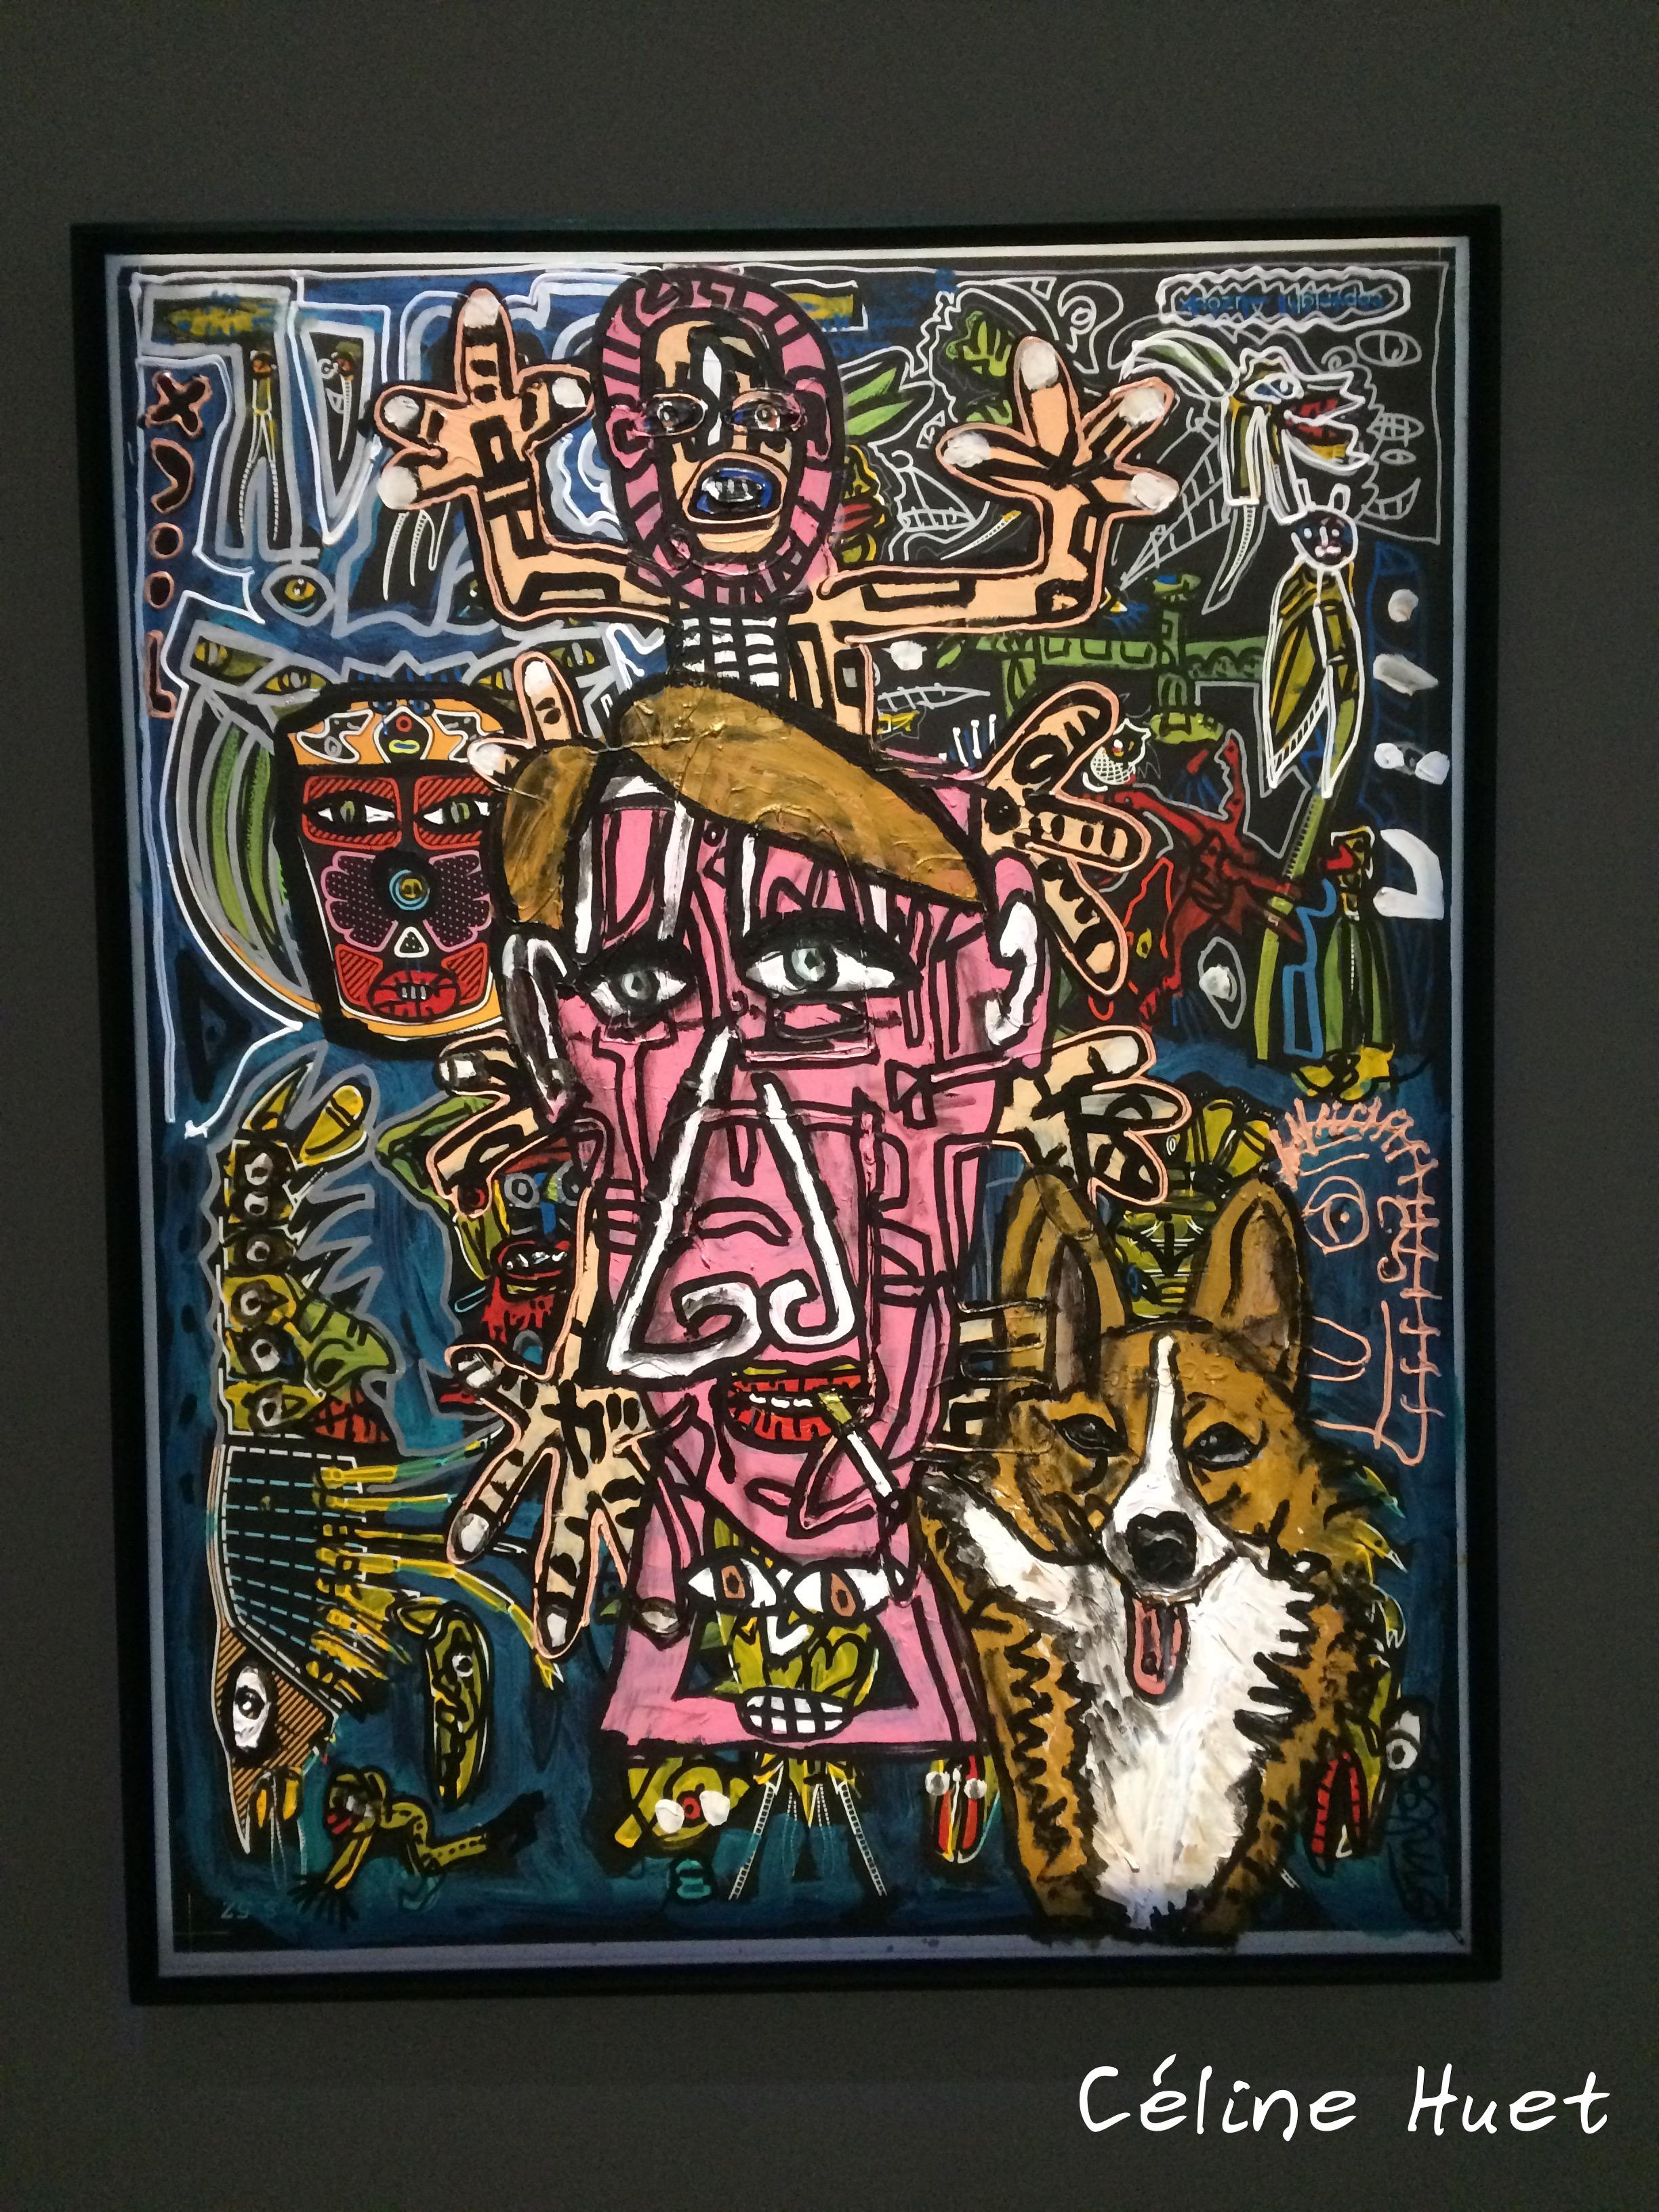 Robert Combas Exposition Rester vivant Michel Houellebecq Palais de Tokyo Paris